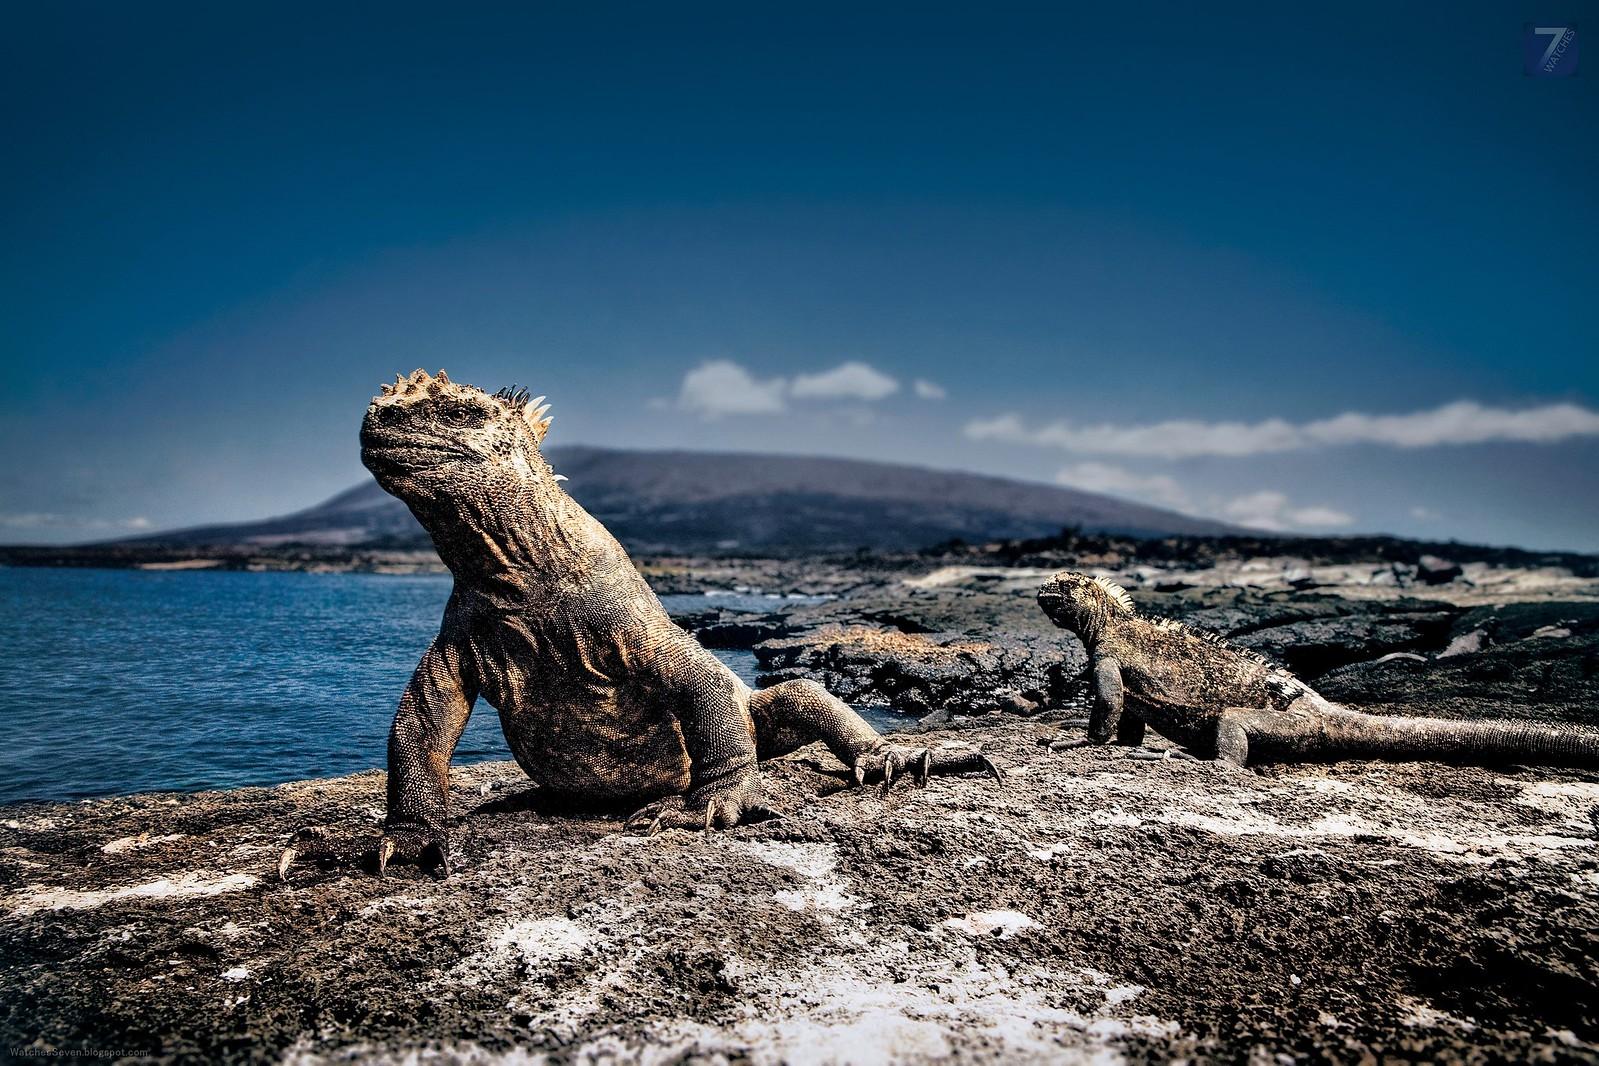 Darwin Beagle Galapagos